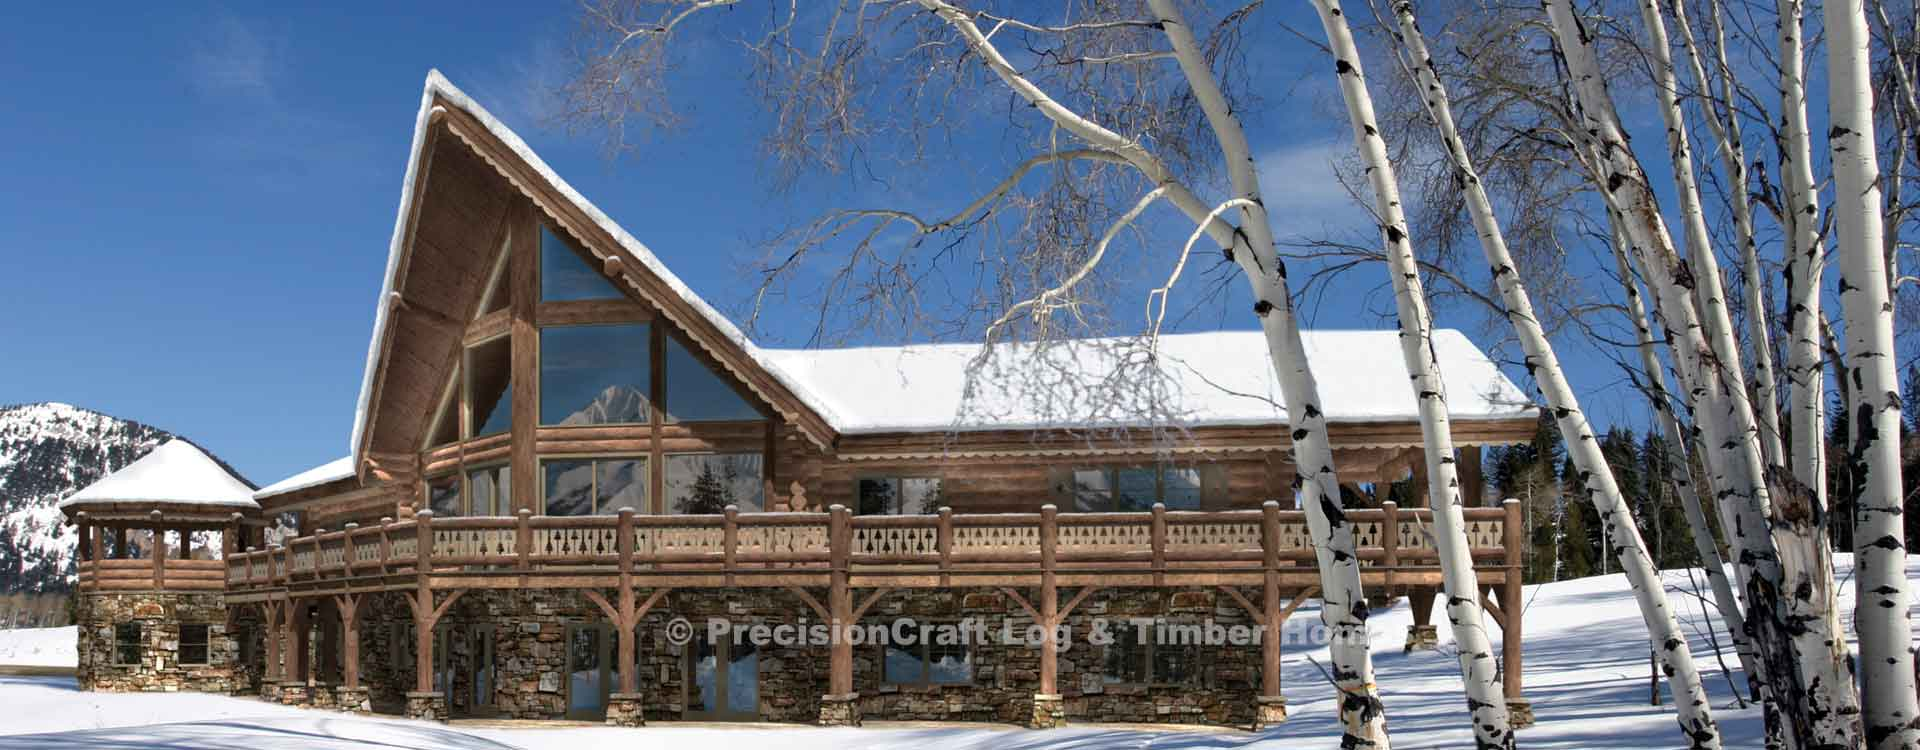 timber frame and log home floor plans by precisioncraft aspen peak log home floor plan